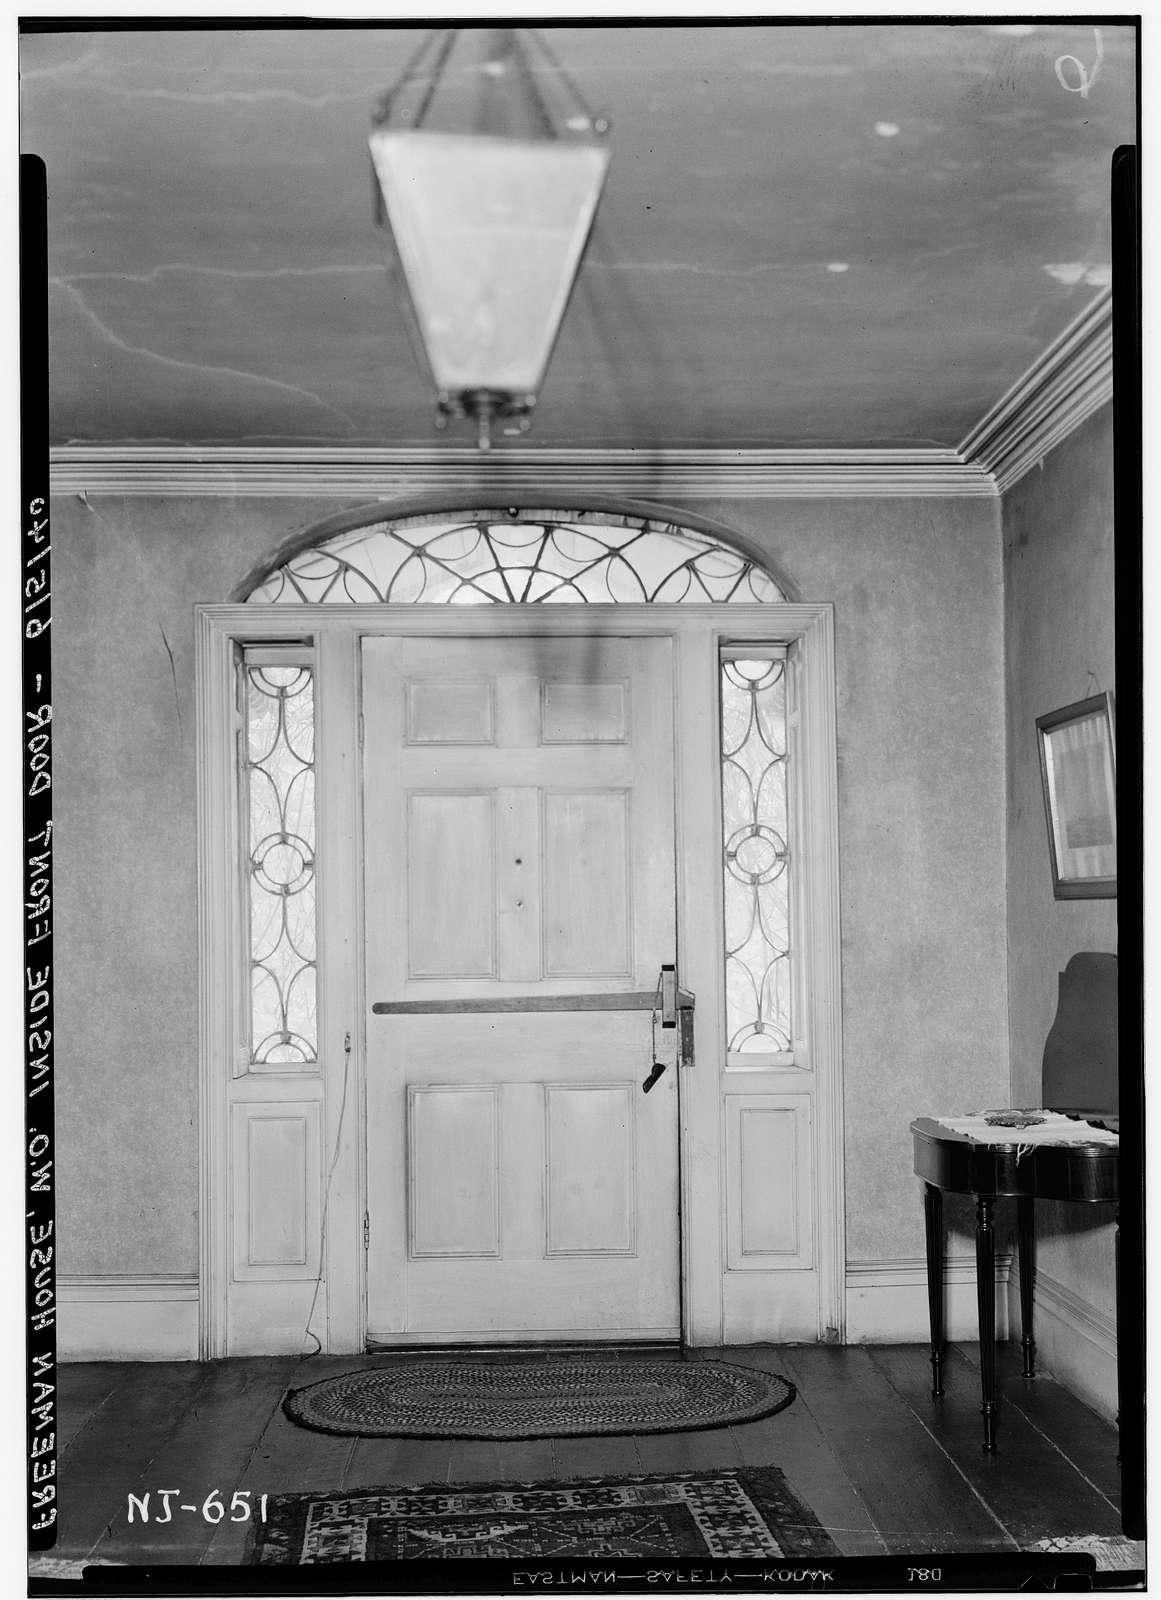 Freeman House, 61 South Valley Road, West Orange, Essex County, NJ